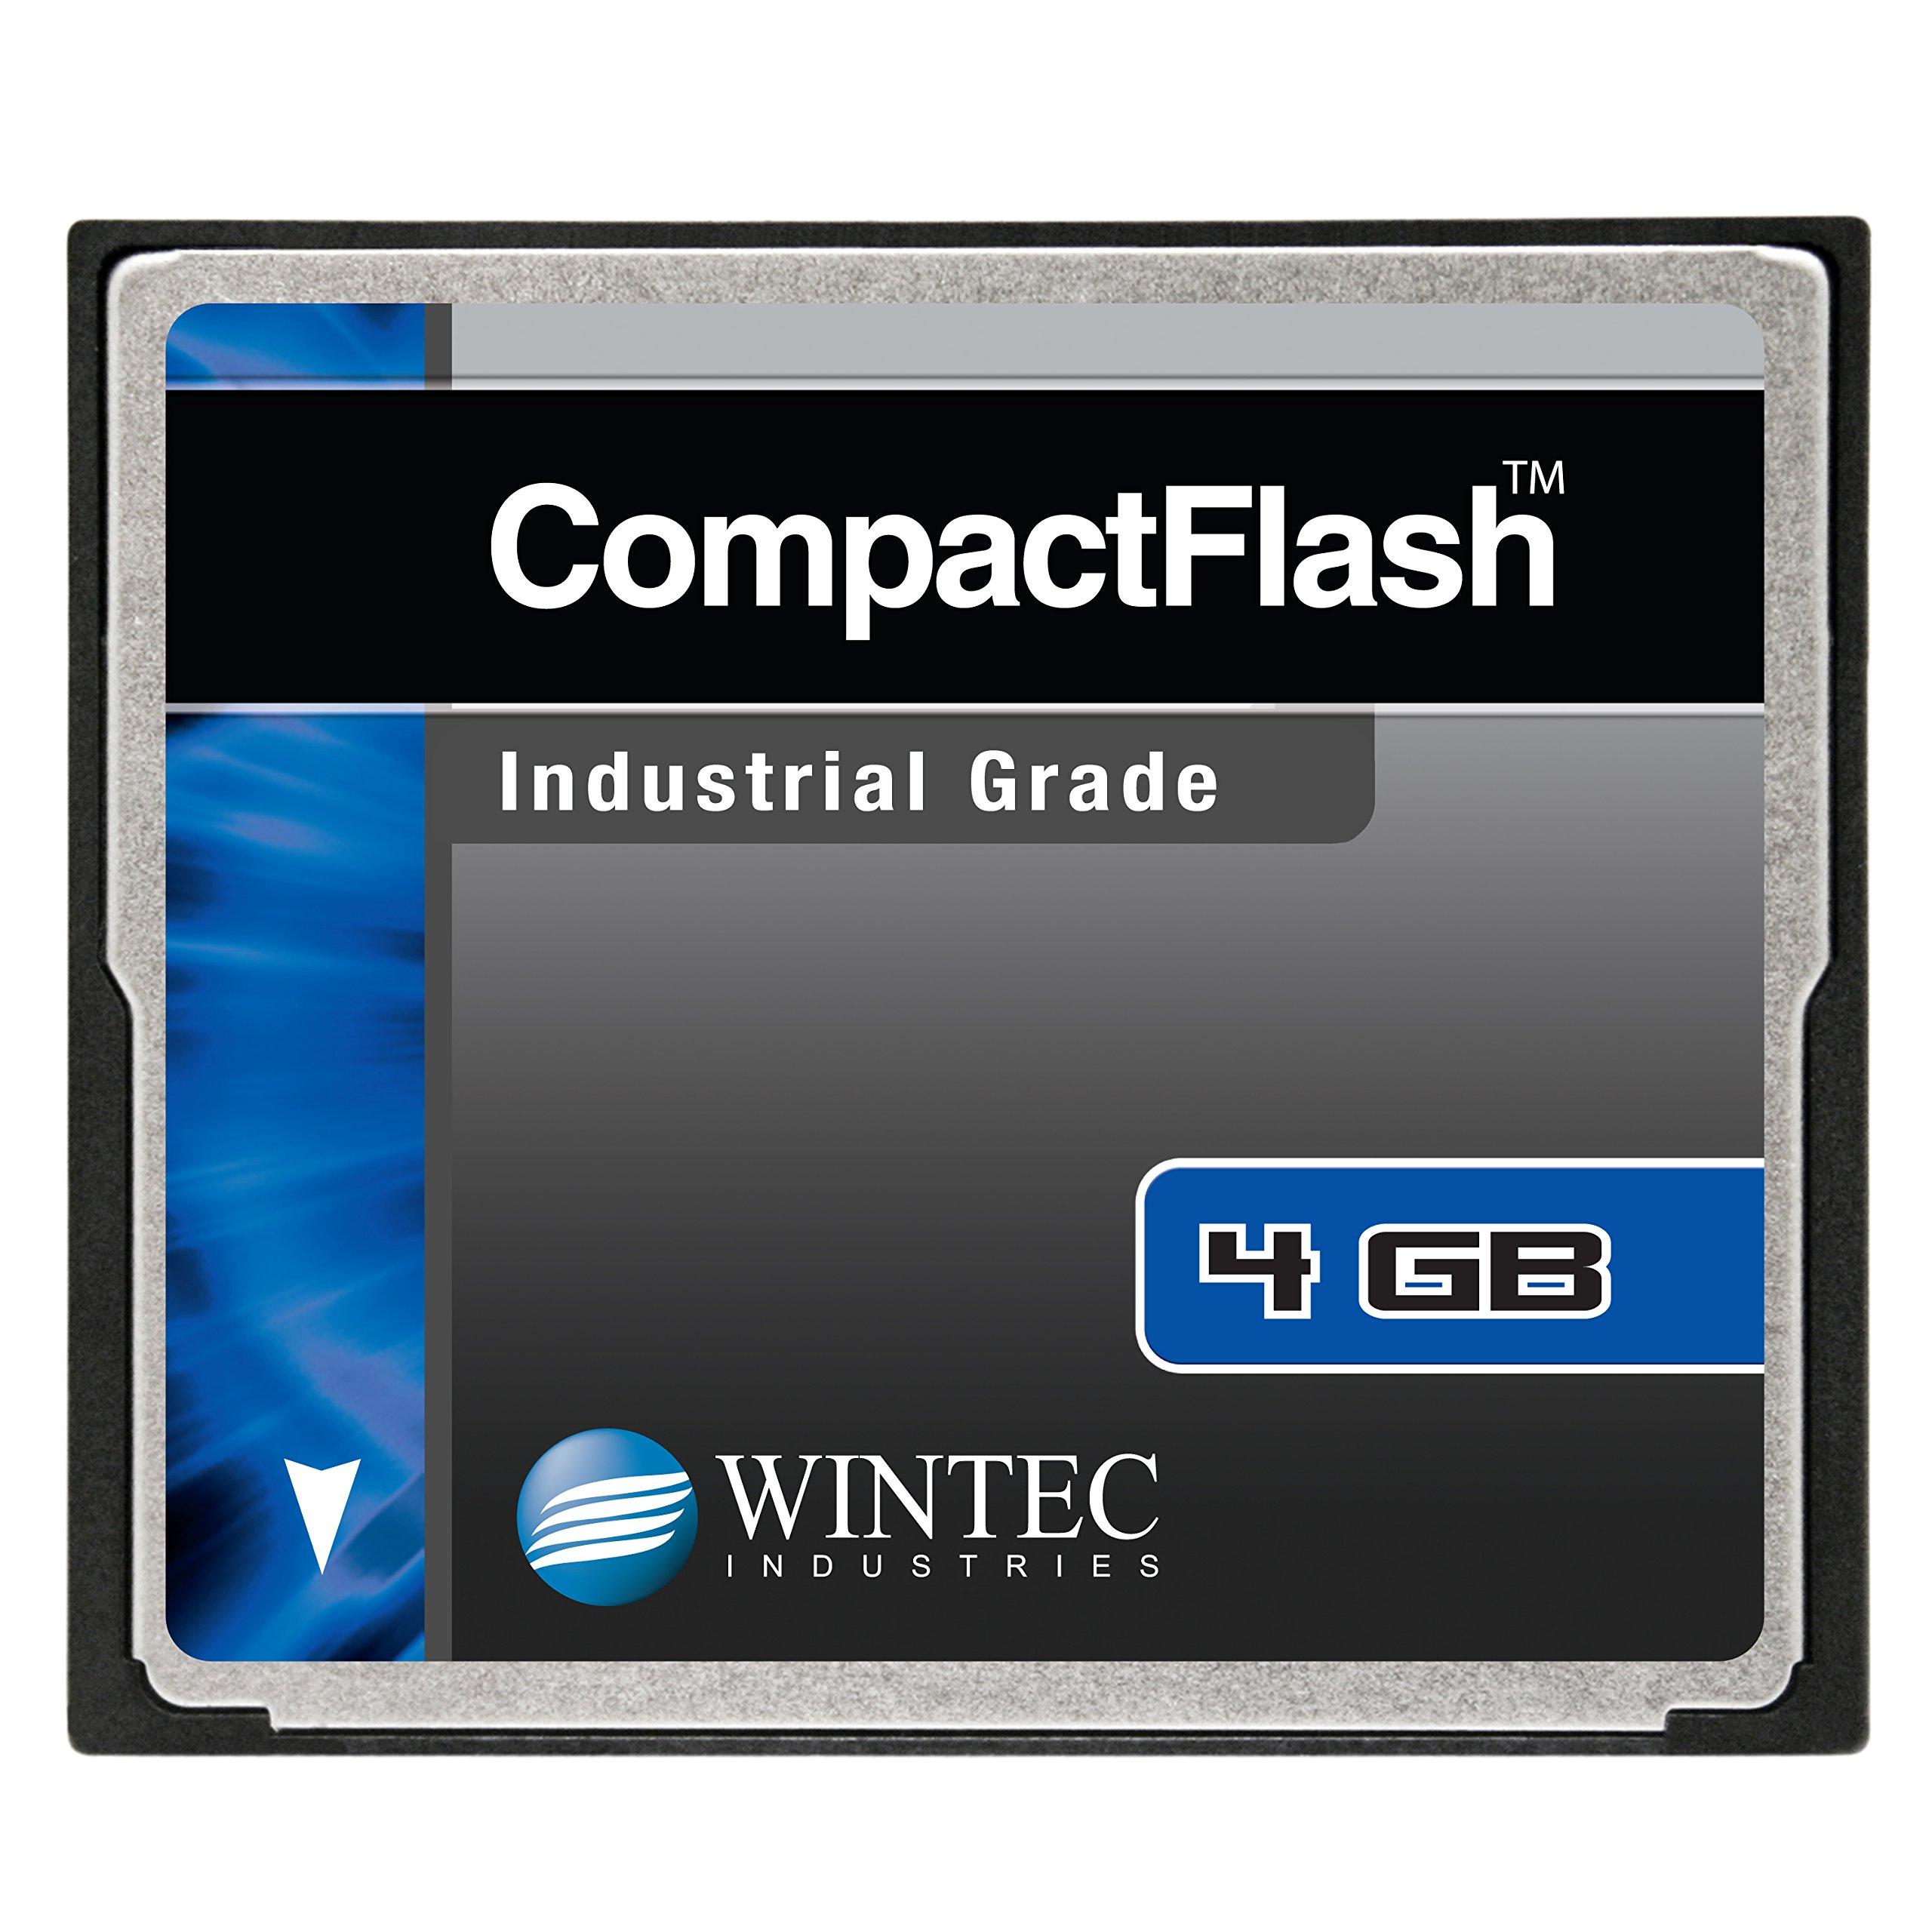 Wintec Compact Flash Card Industrial Grade SLC Nand 4GB, Black (33100004GCF)